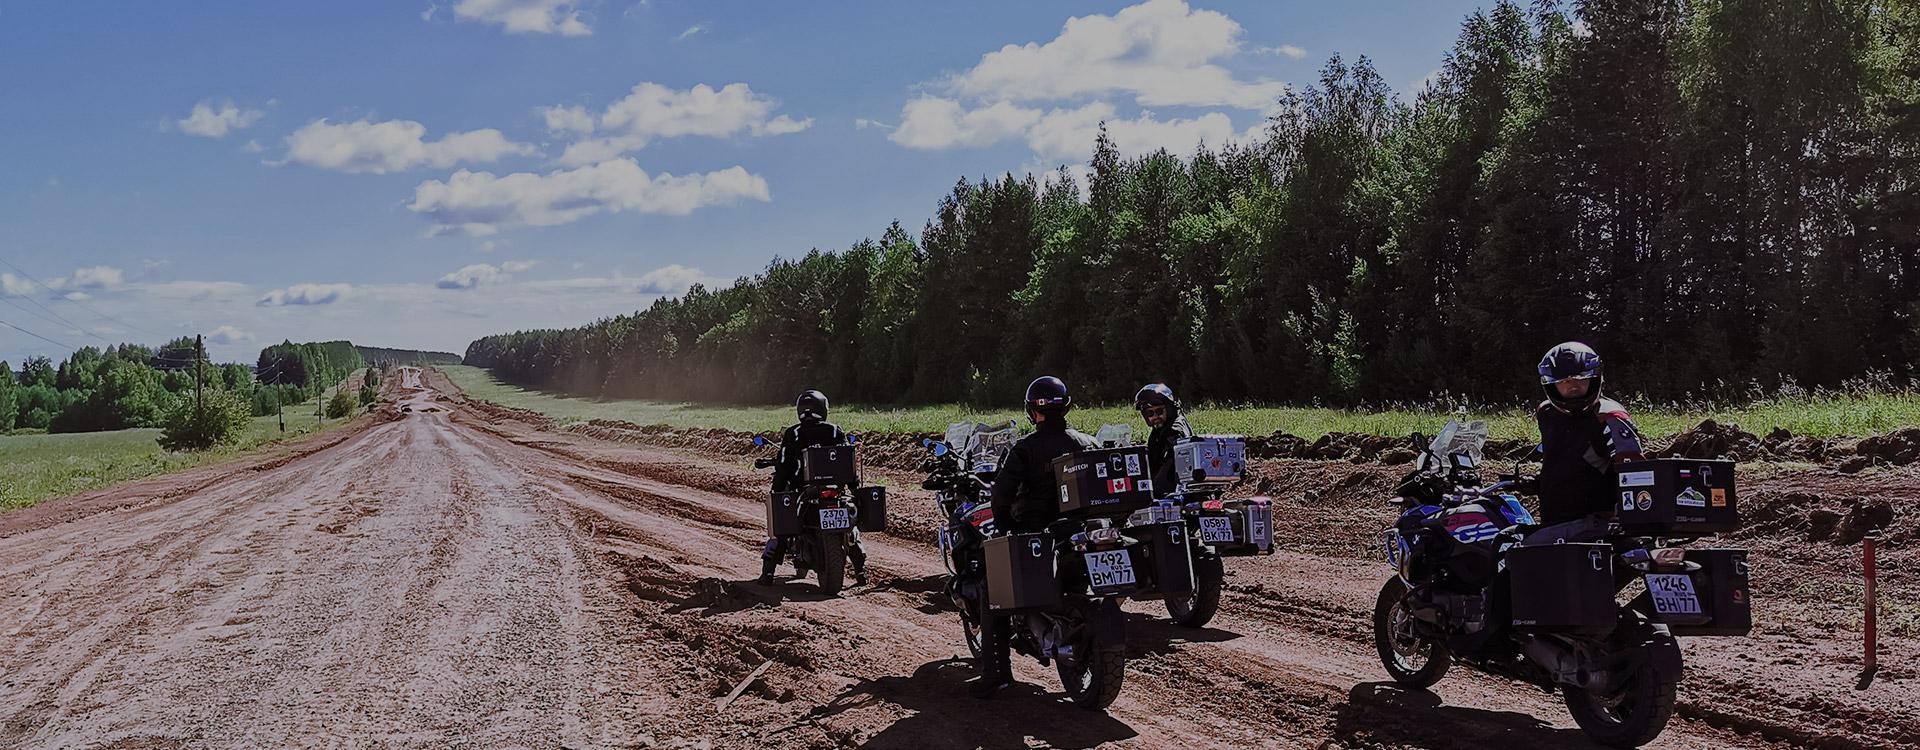 voyage-moto-russie-transsiberien-moscou-vladivostok-siberie-ural-bmw-gs-ride-n-be-1